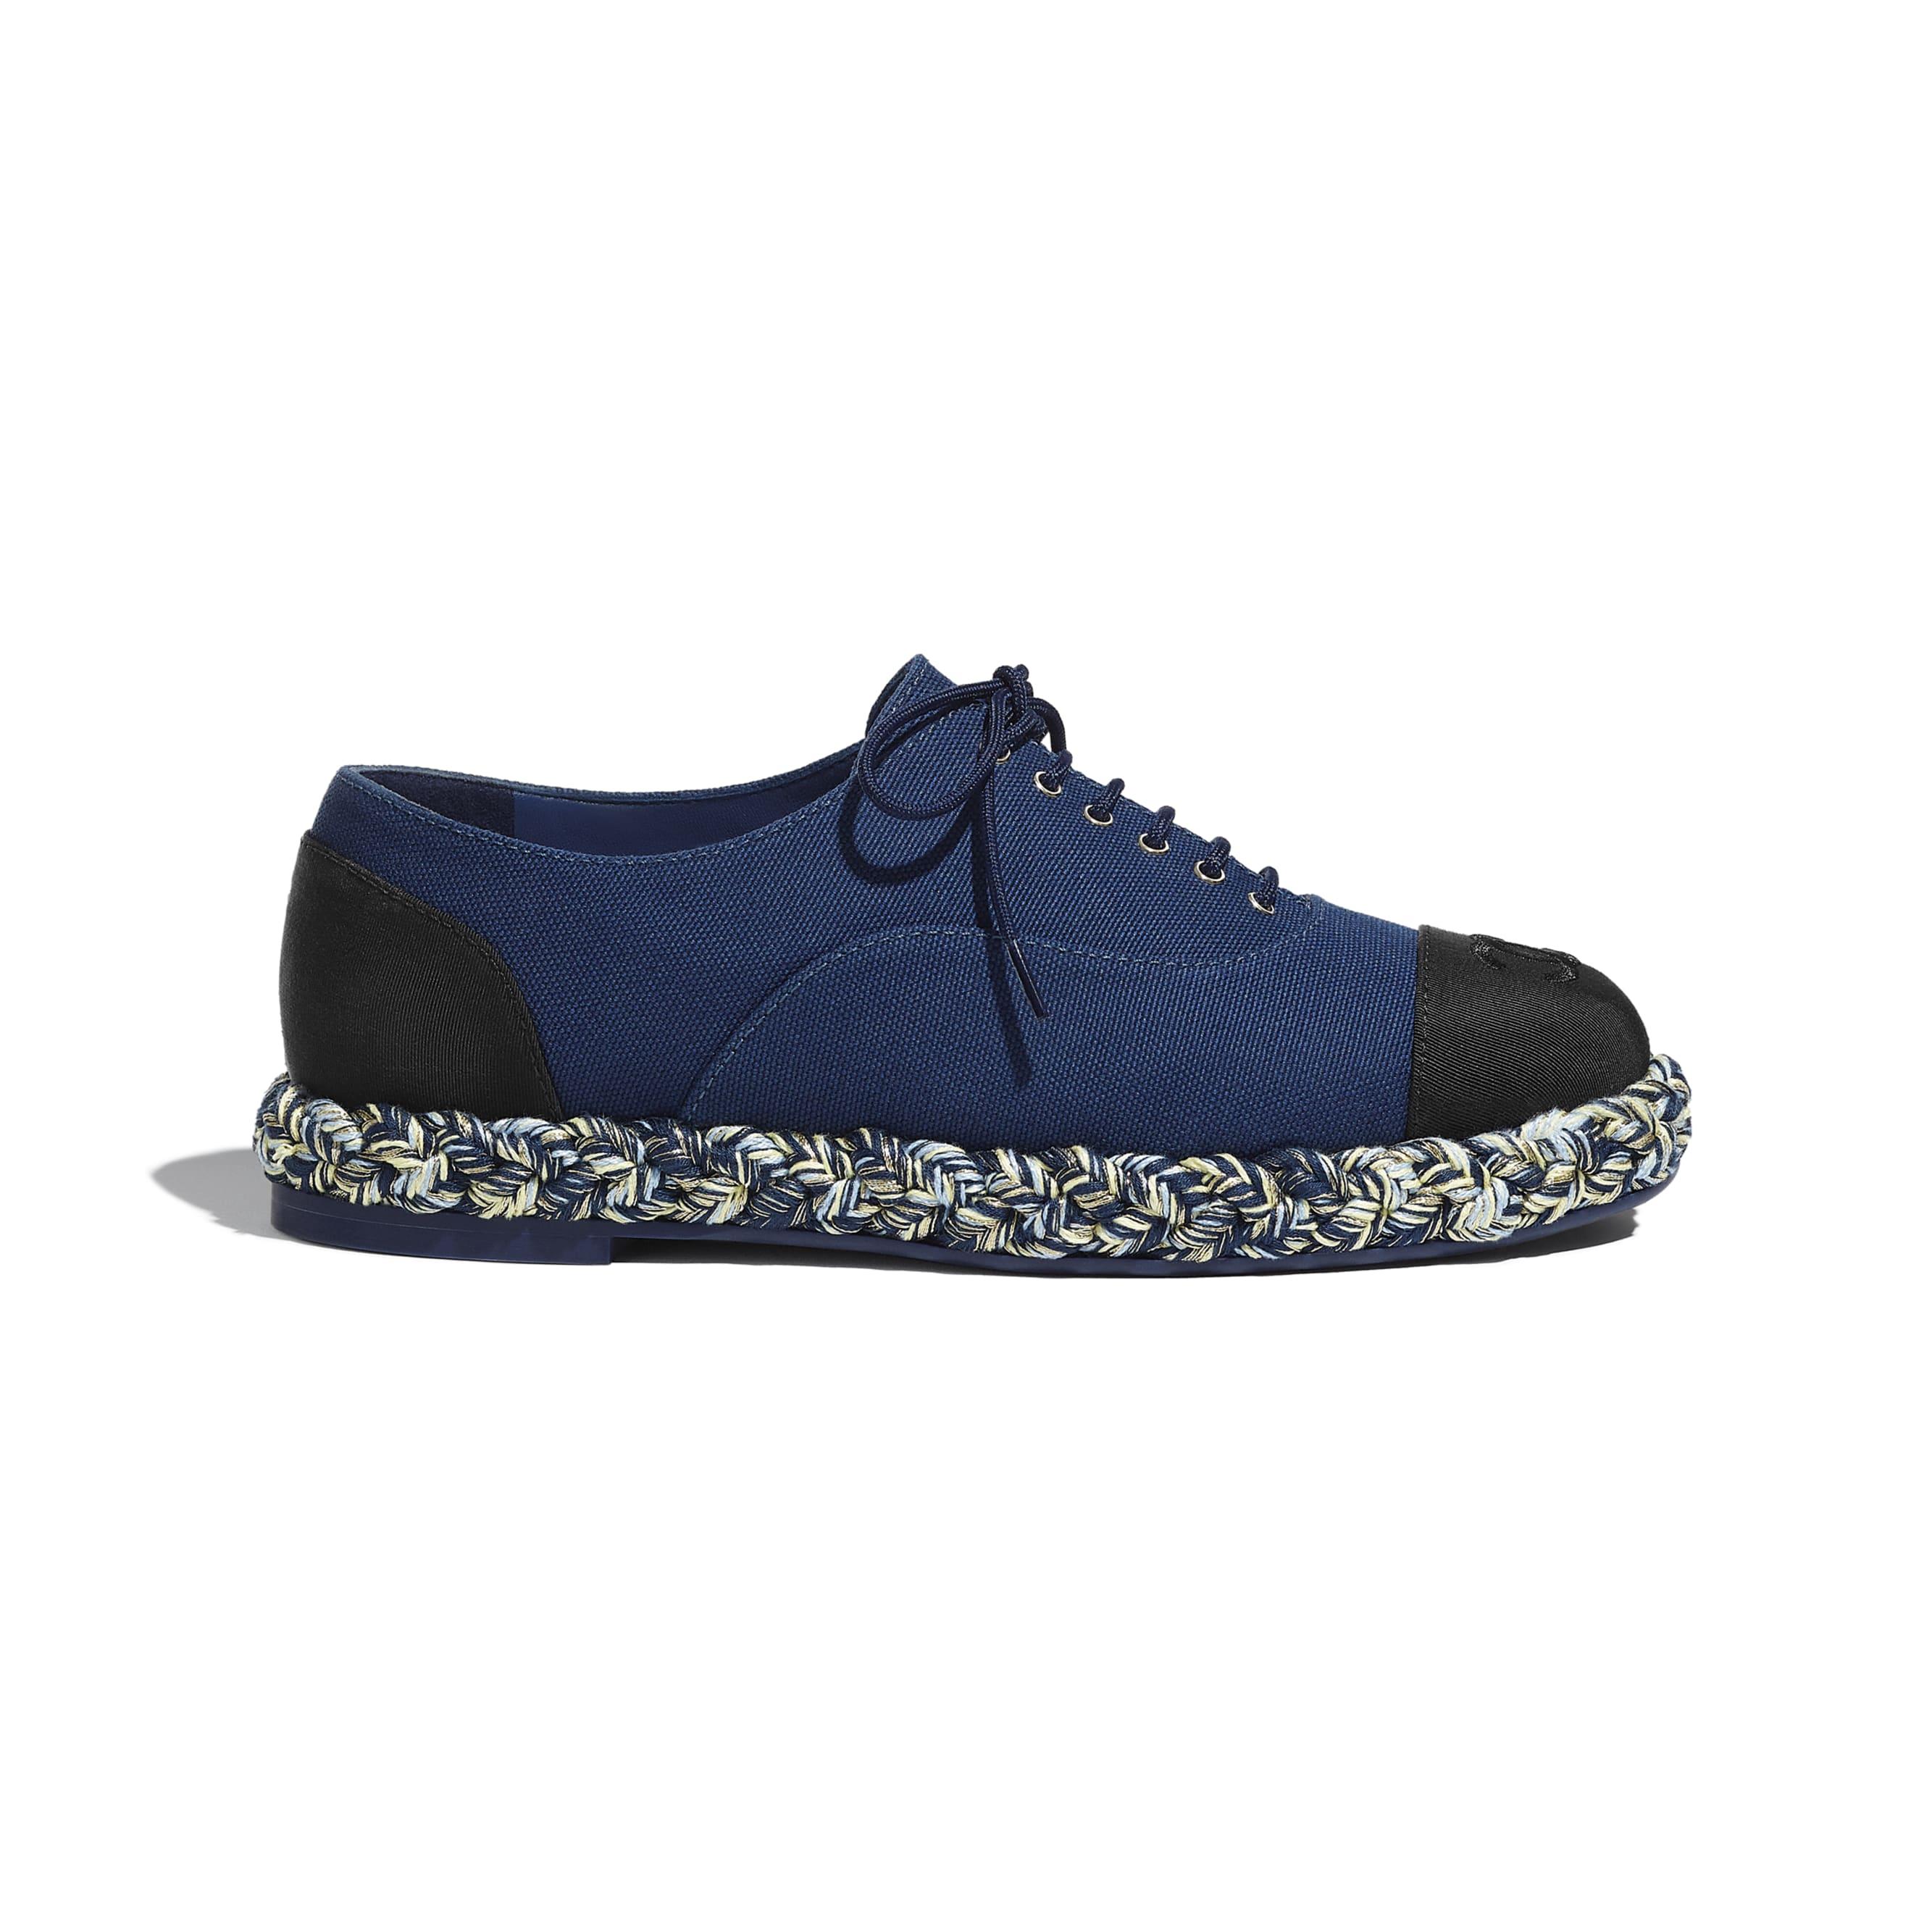 Lace-Ups - Navy Blue & Black - Cotton & Grosgrain - CHANEL - Default view - see standard sized version